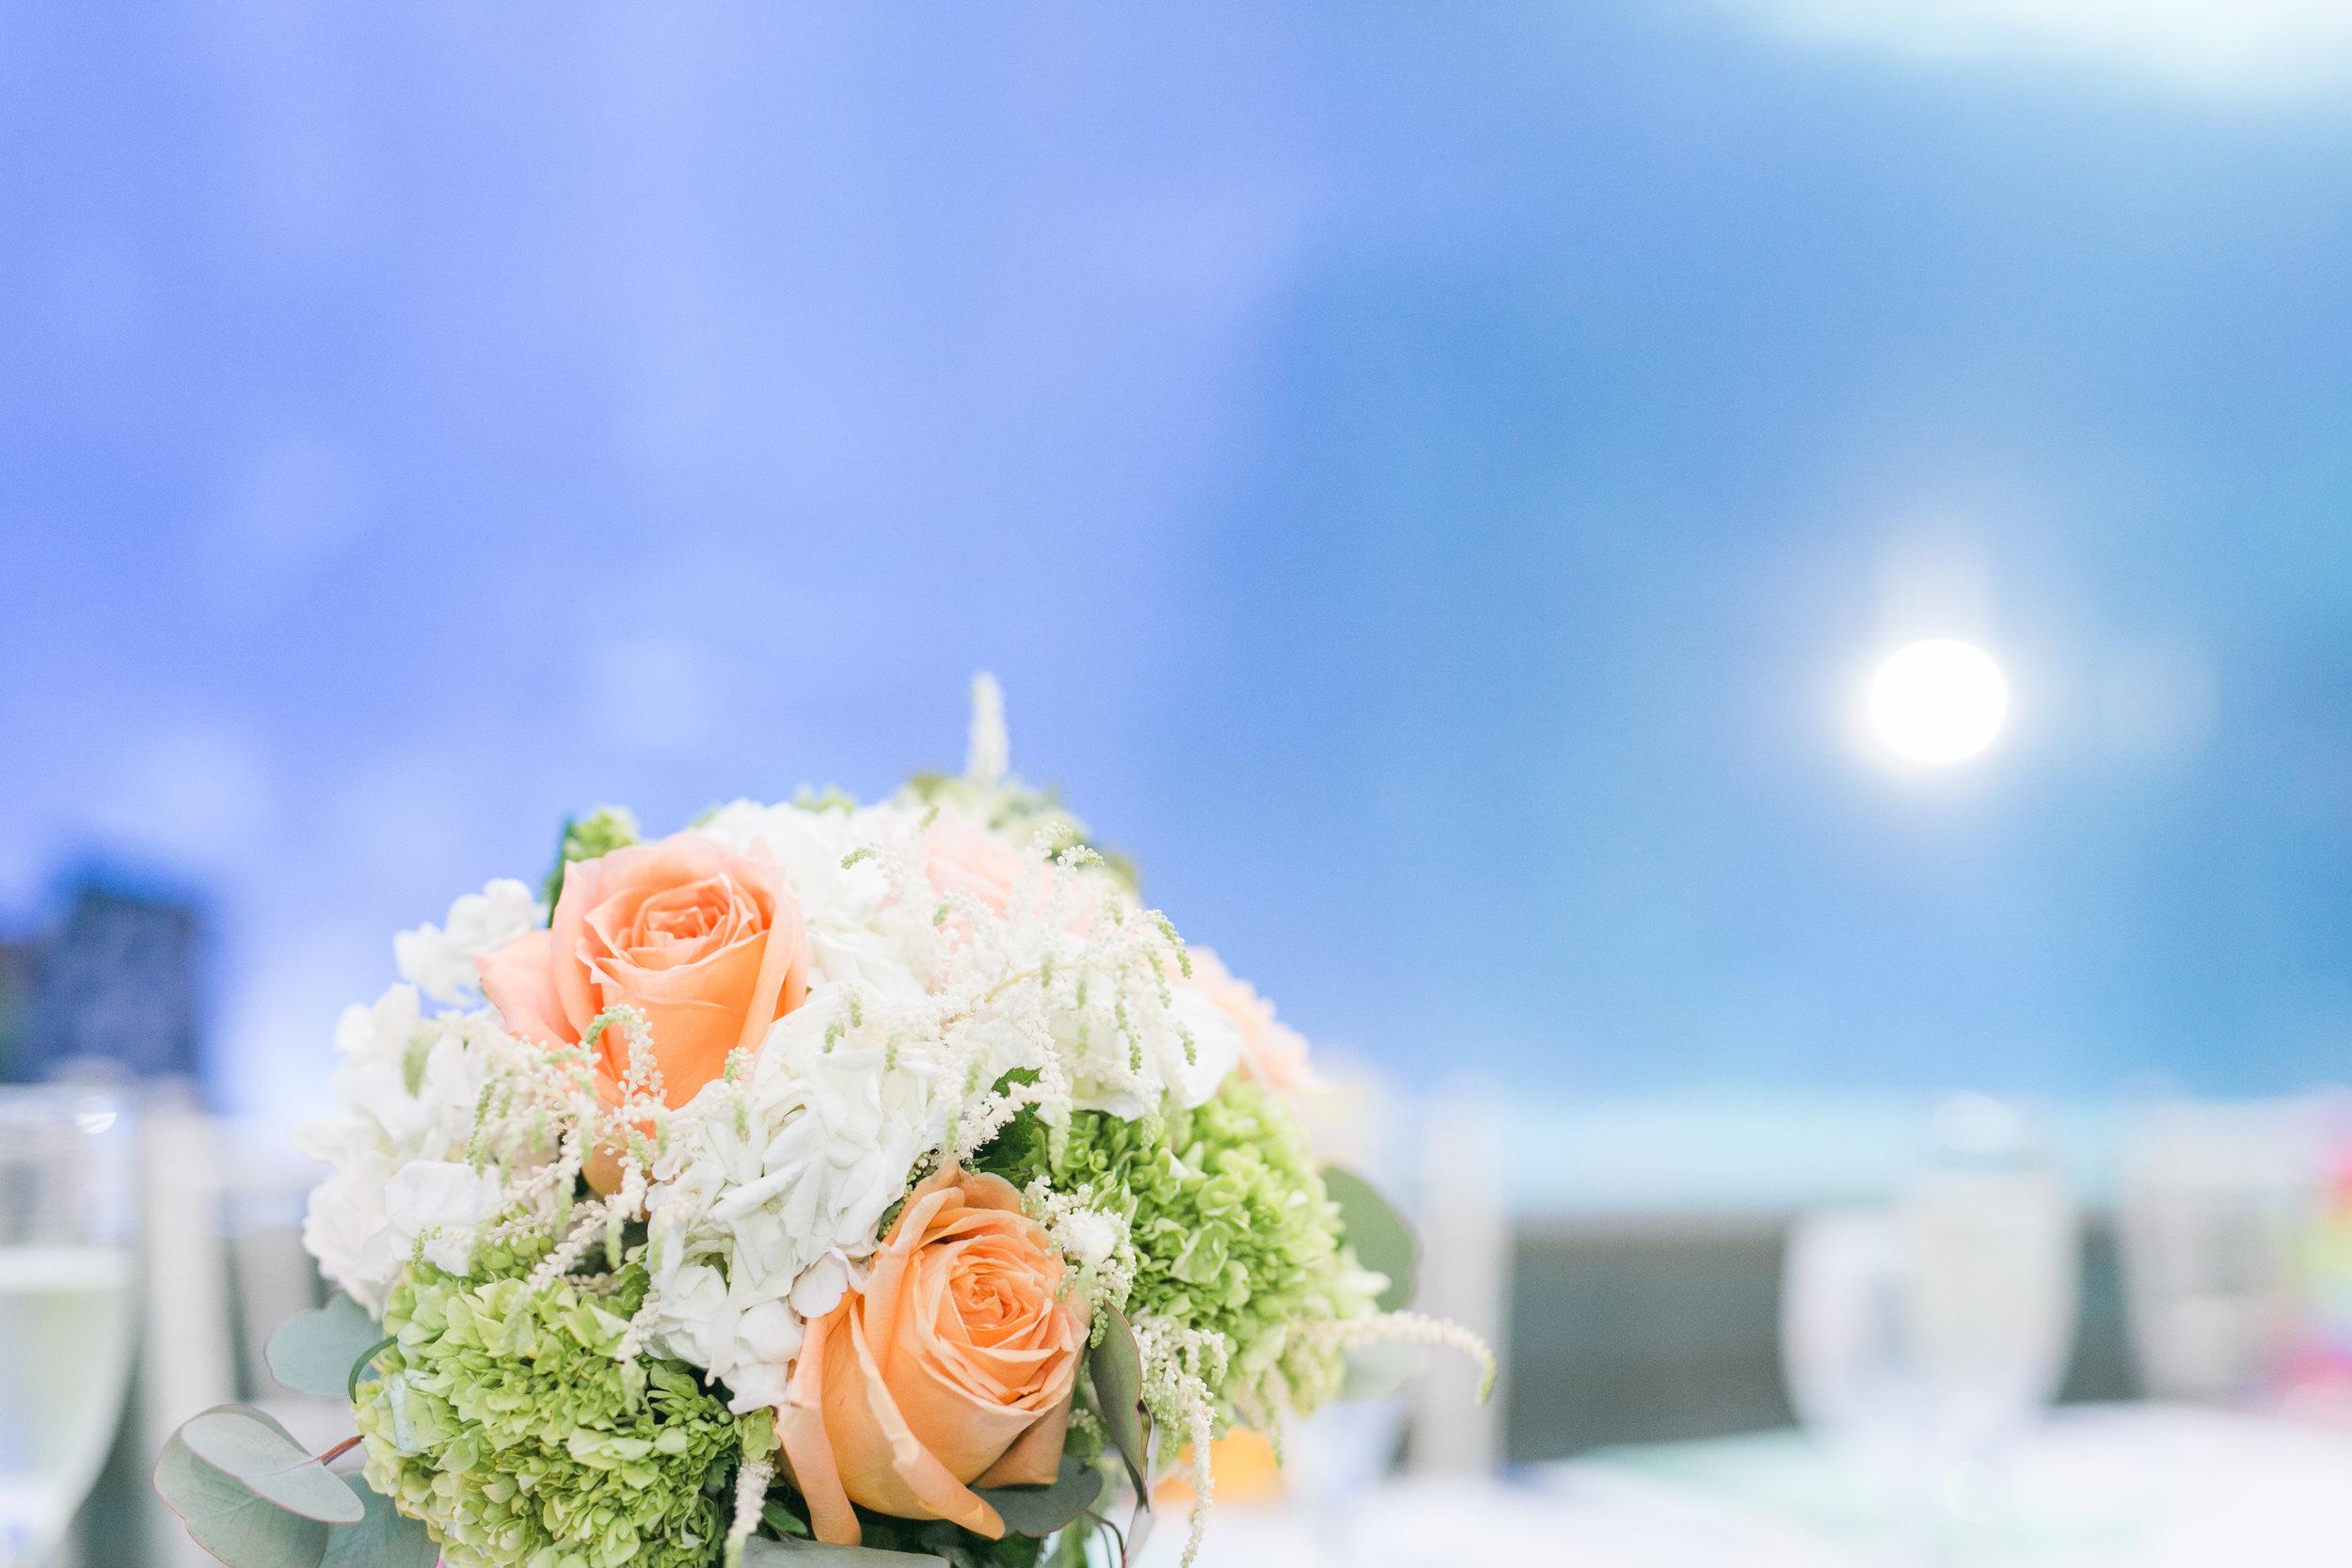 imlay wedding more-9539.jpg